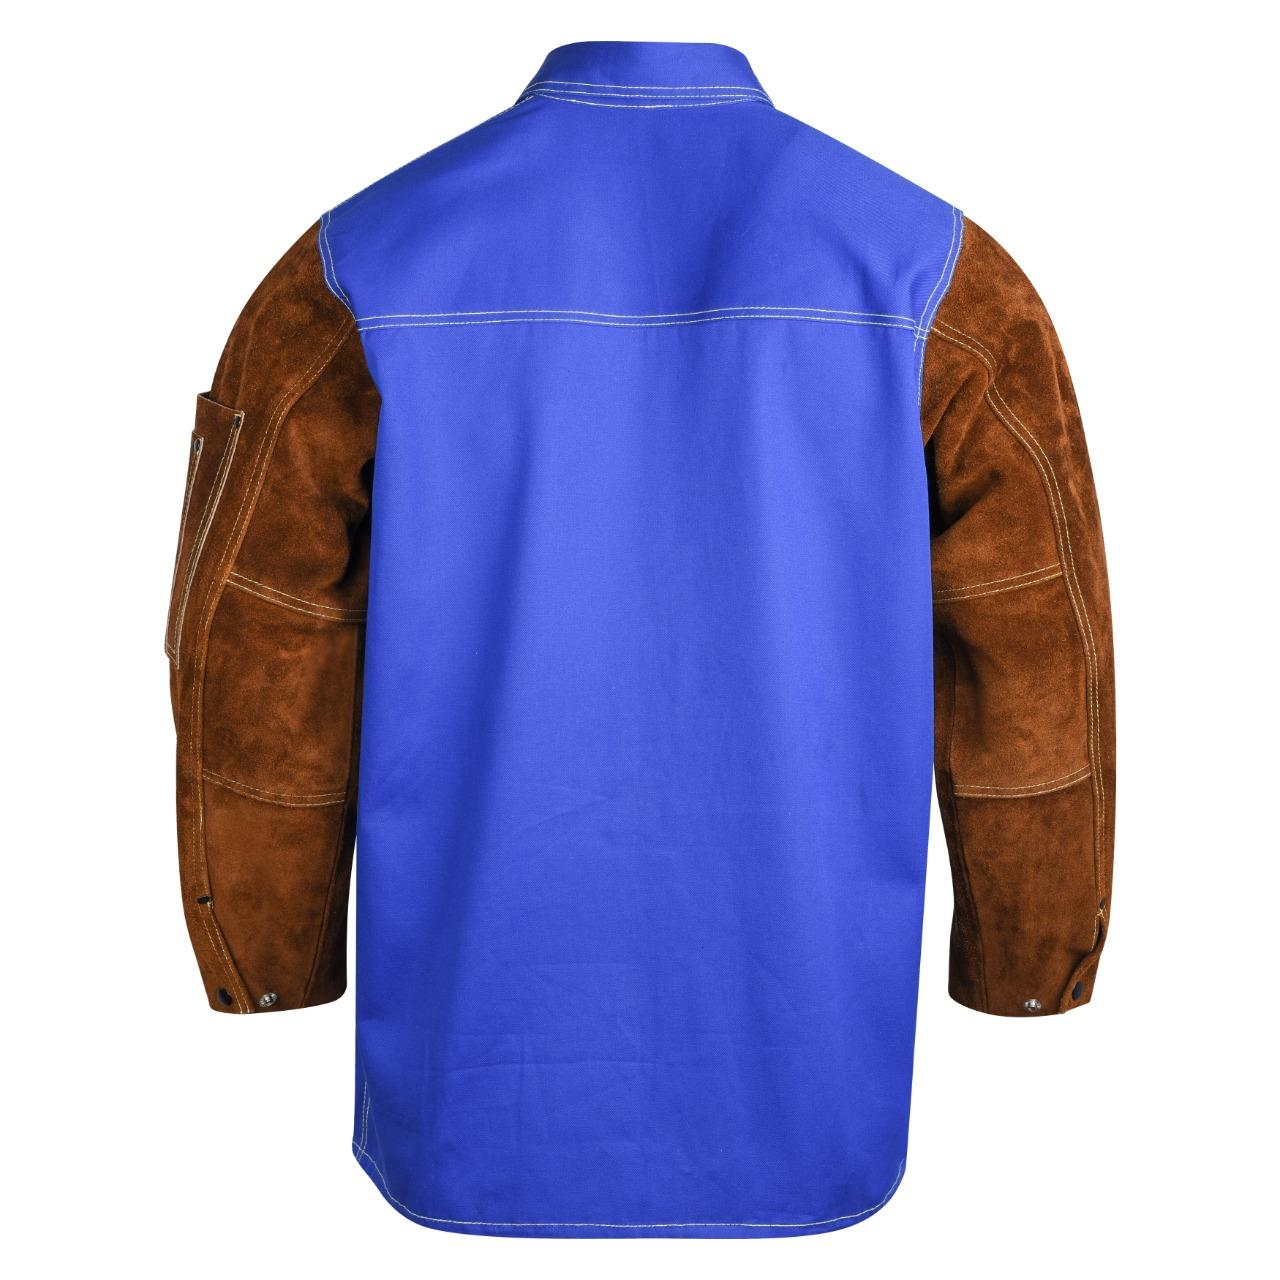 FR cotton jacket for light welding tasks